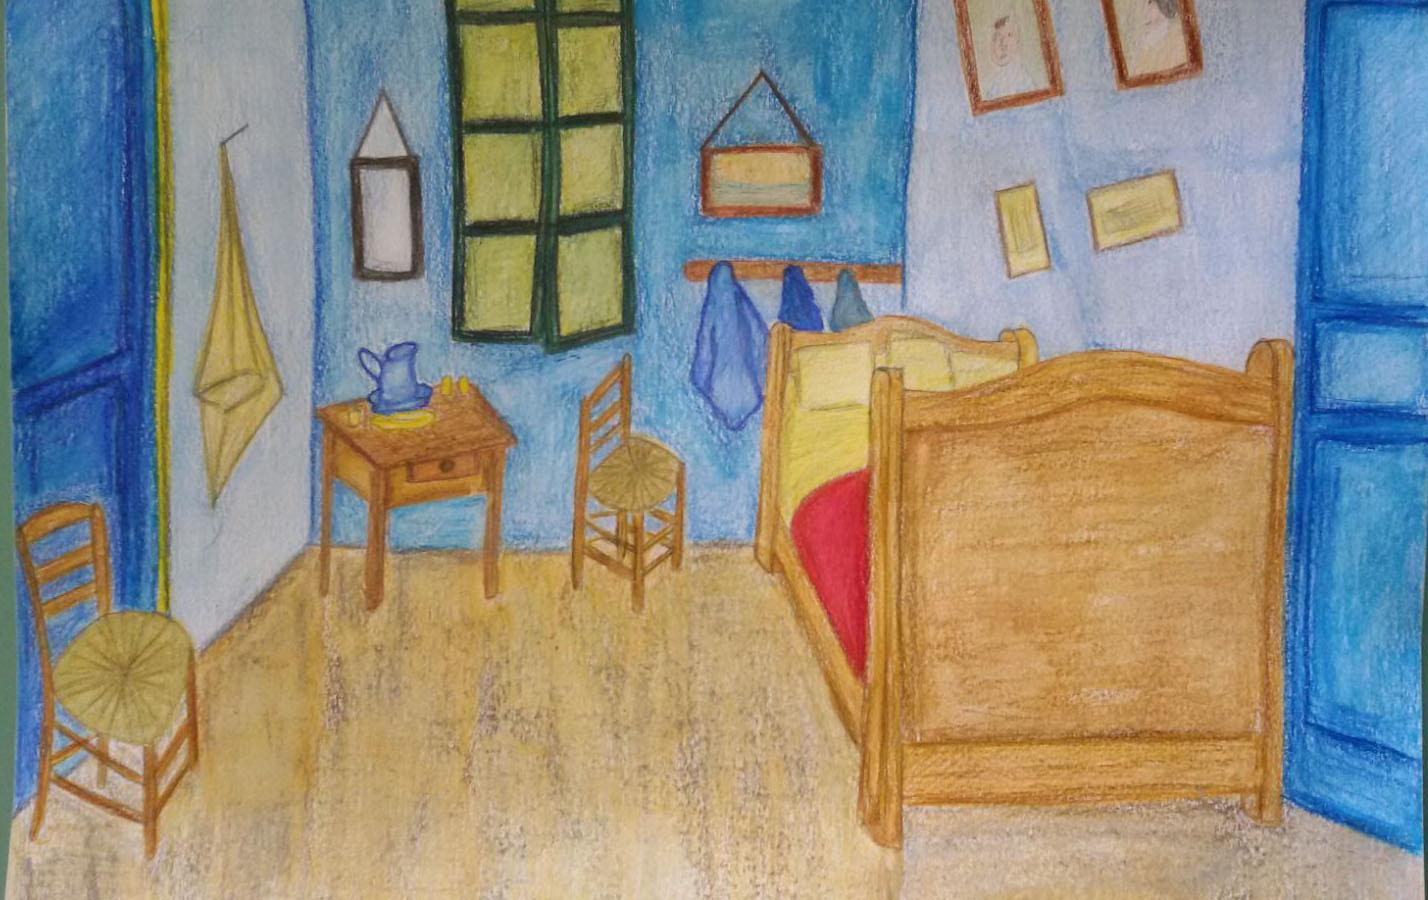 Amazing La Camera Da Letto Di Van Gogh Images - Carolineskywalker ...